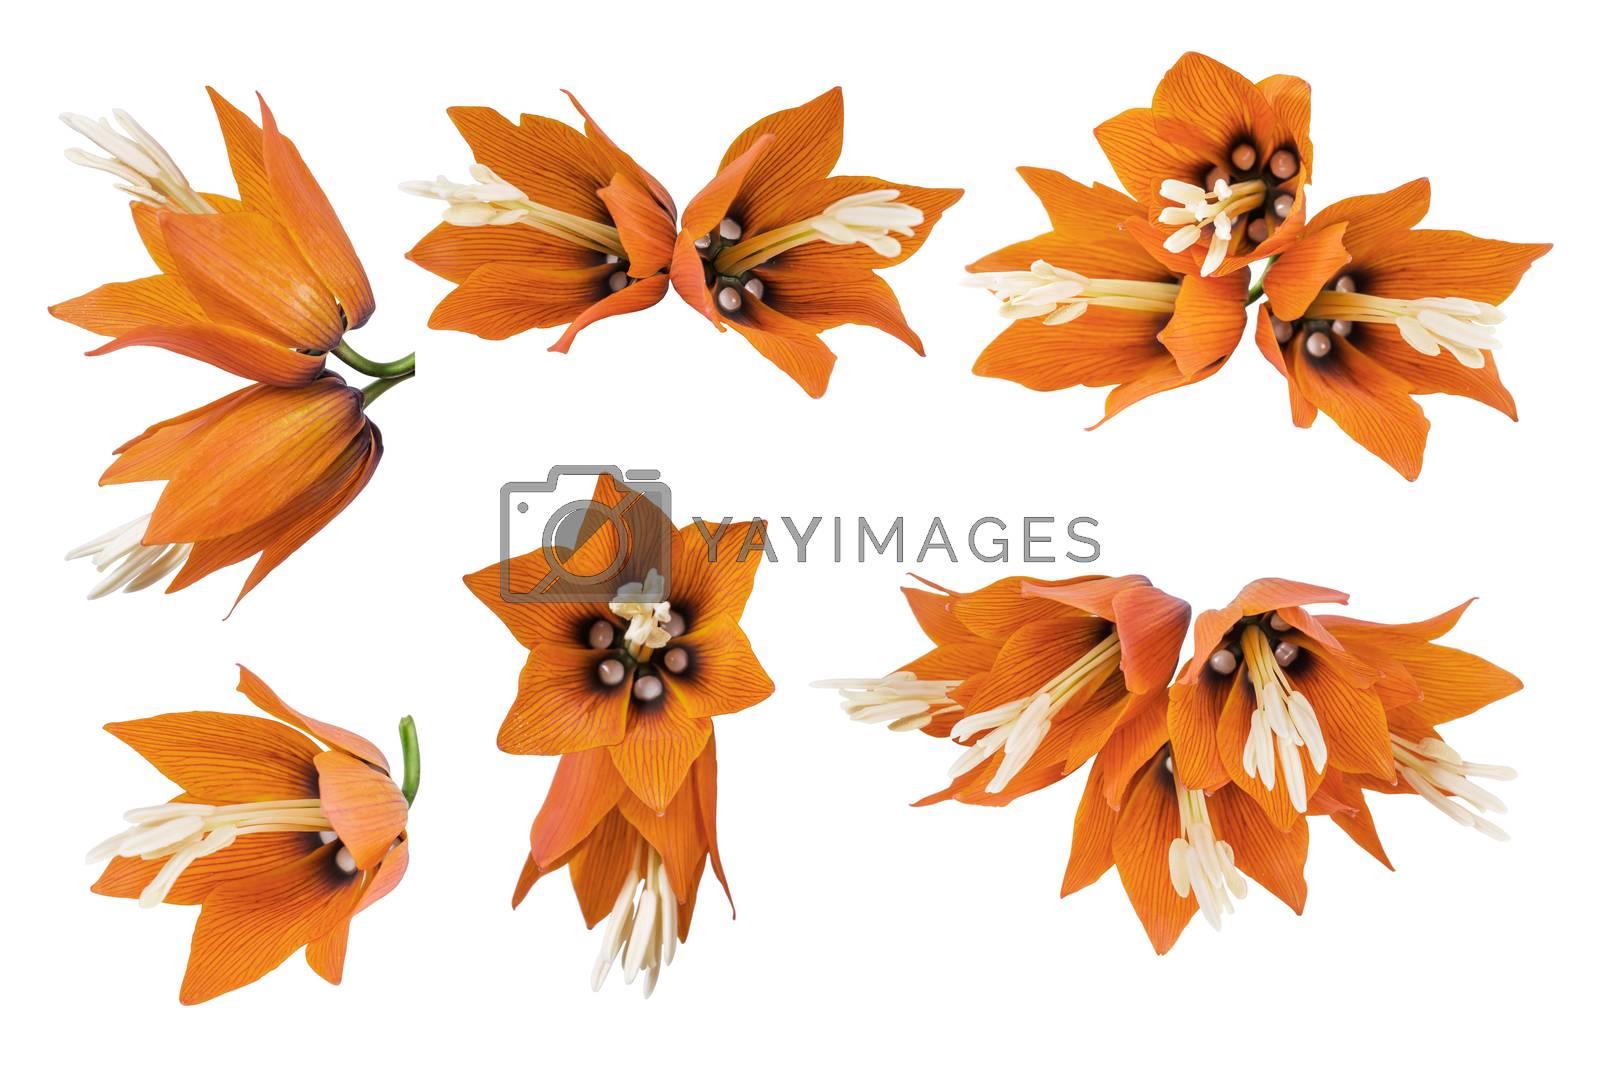 Set orange crown imperial flowers (Fritillaria imperialis) isolated on white background